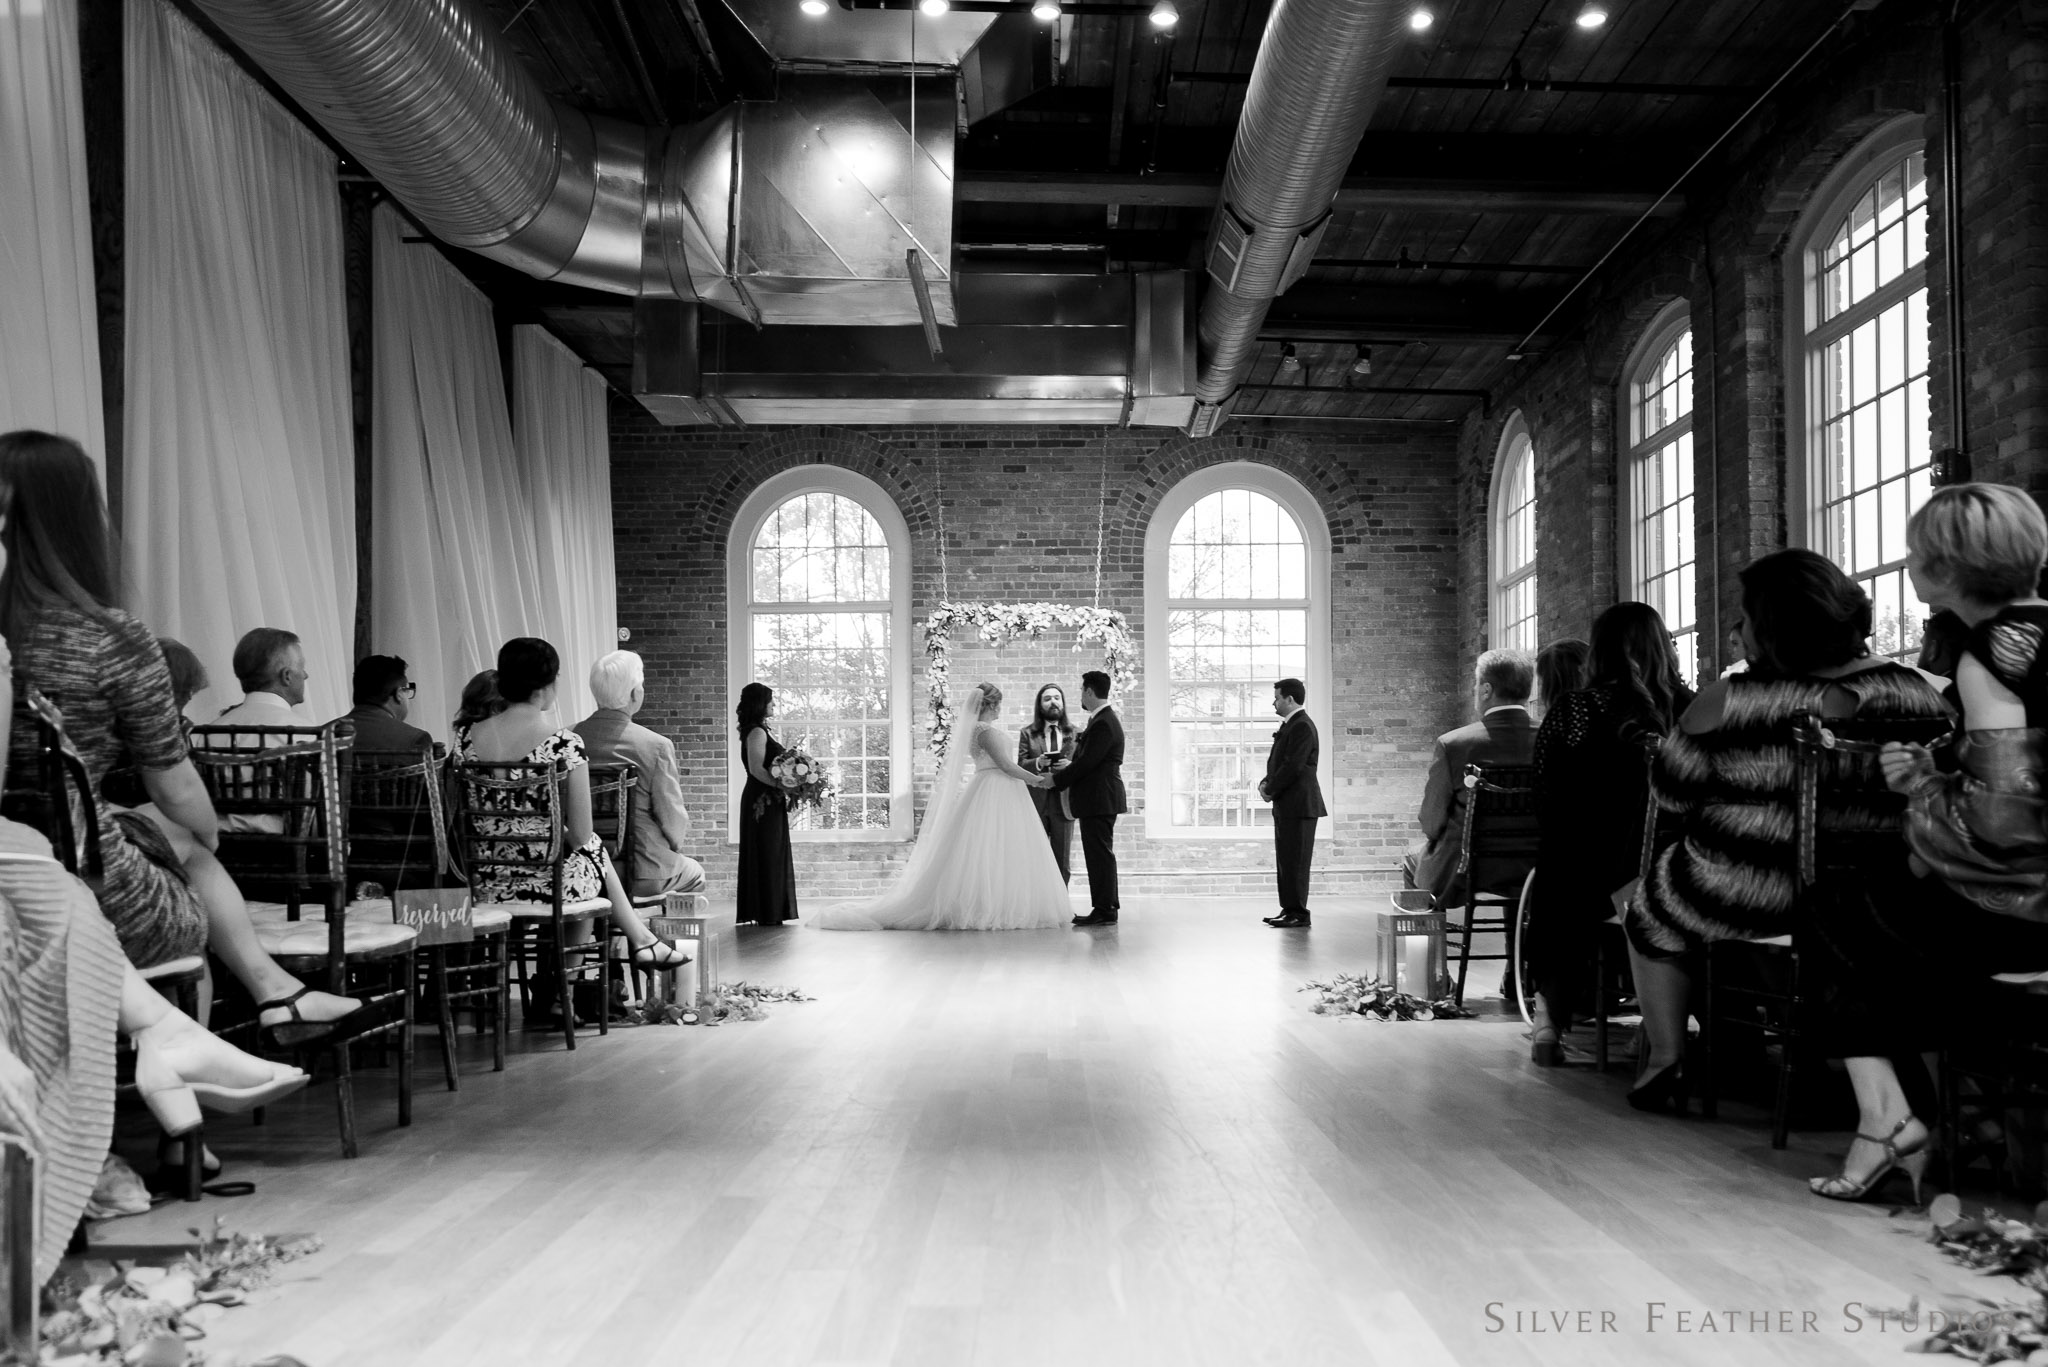 cottom-room-wedding-photography-032.jpg